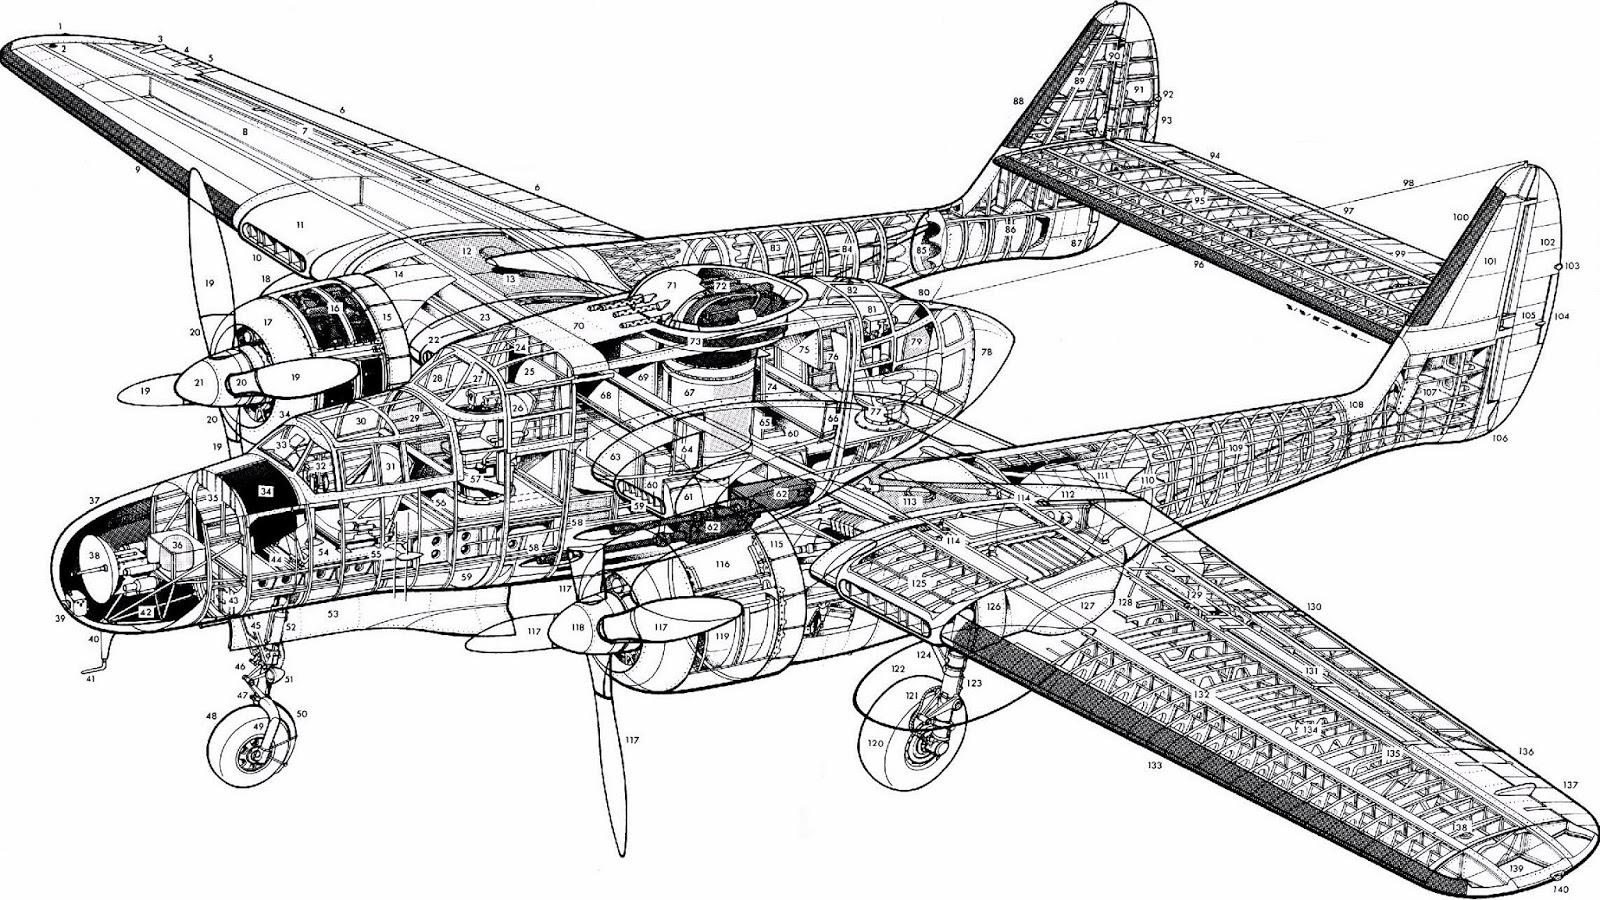 northrop p-61 black widow cutaway drawing